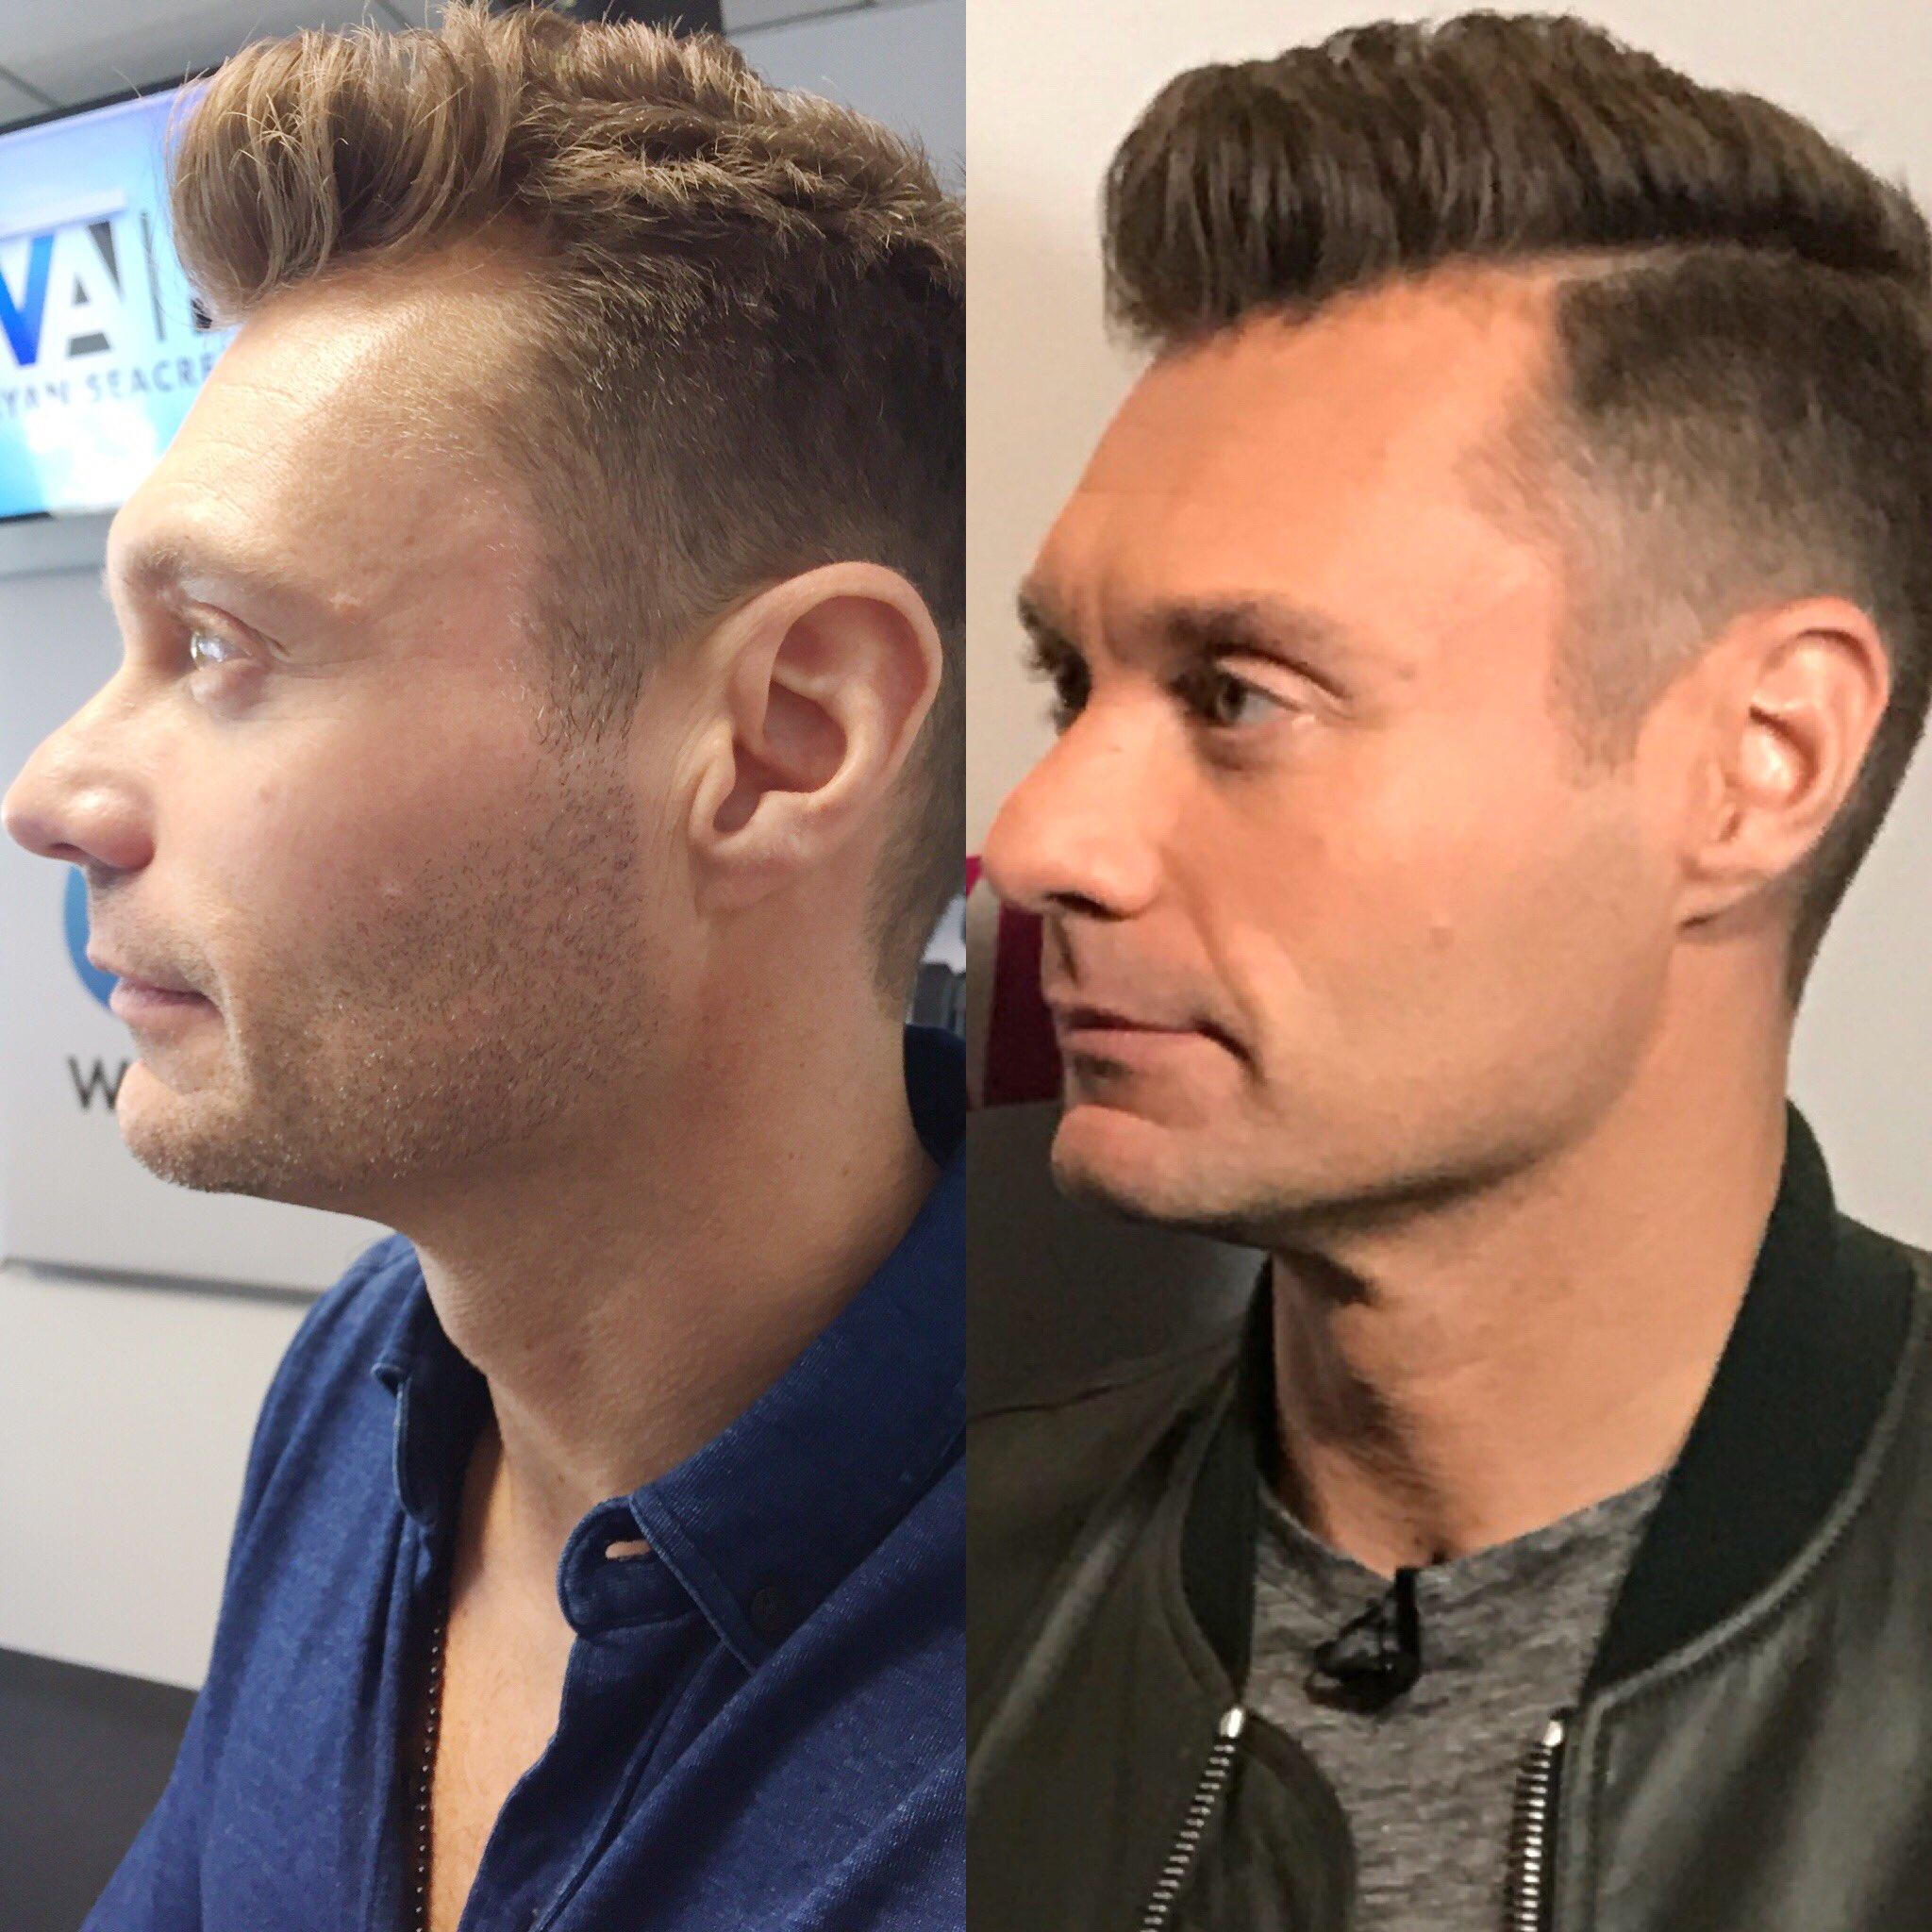 Ryan Seacrest On Twitter Finally Got That Etch Haircut